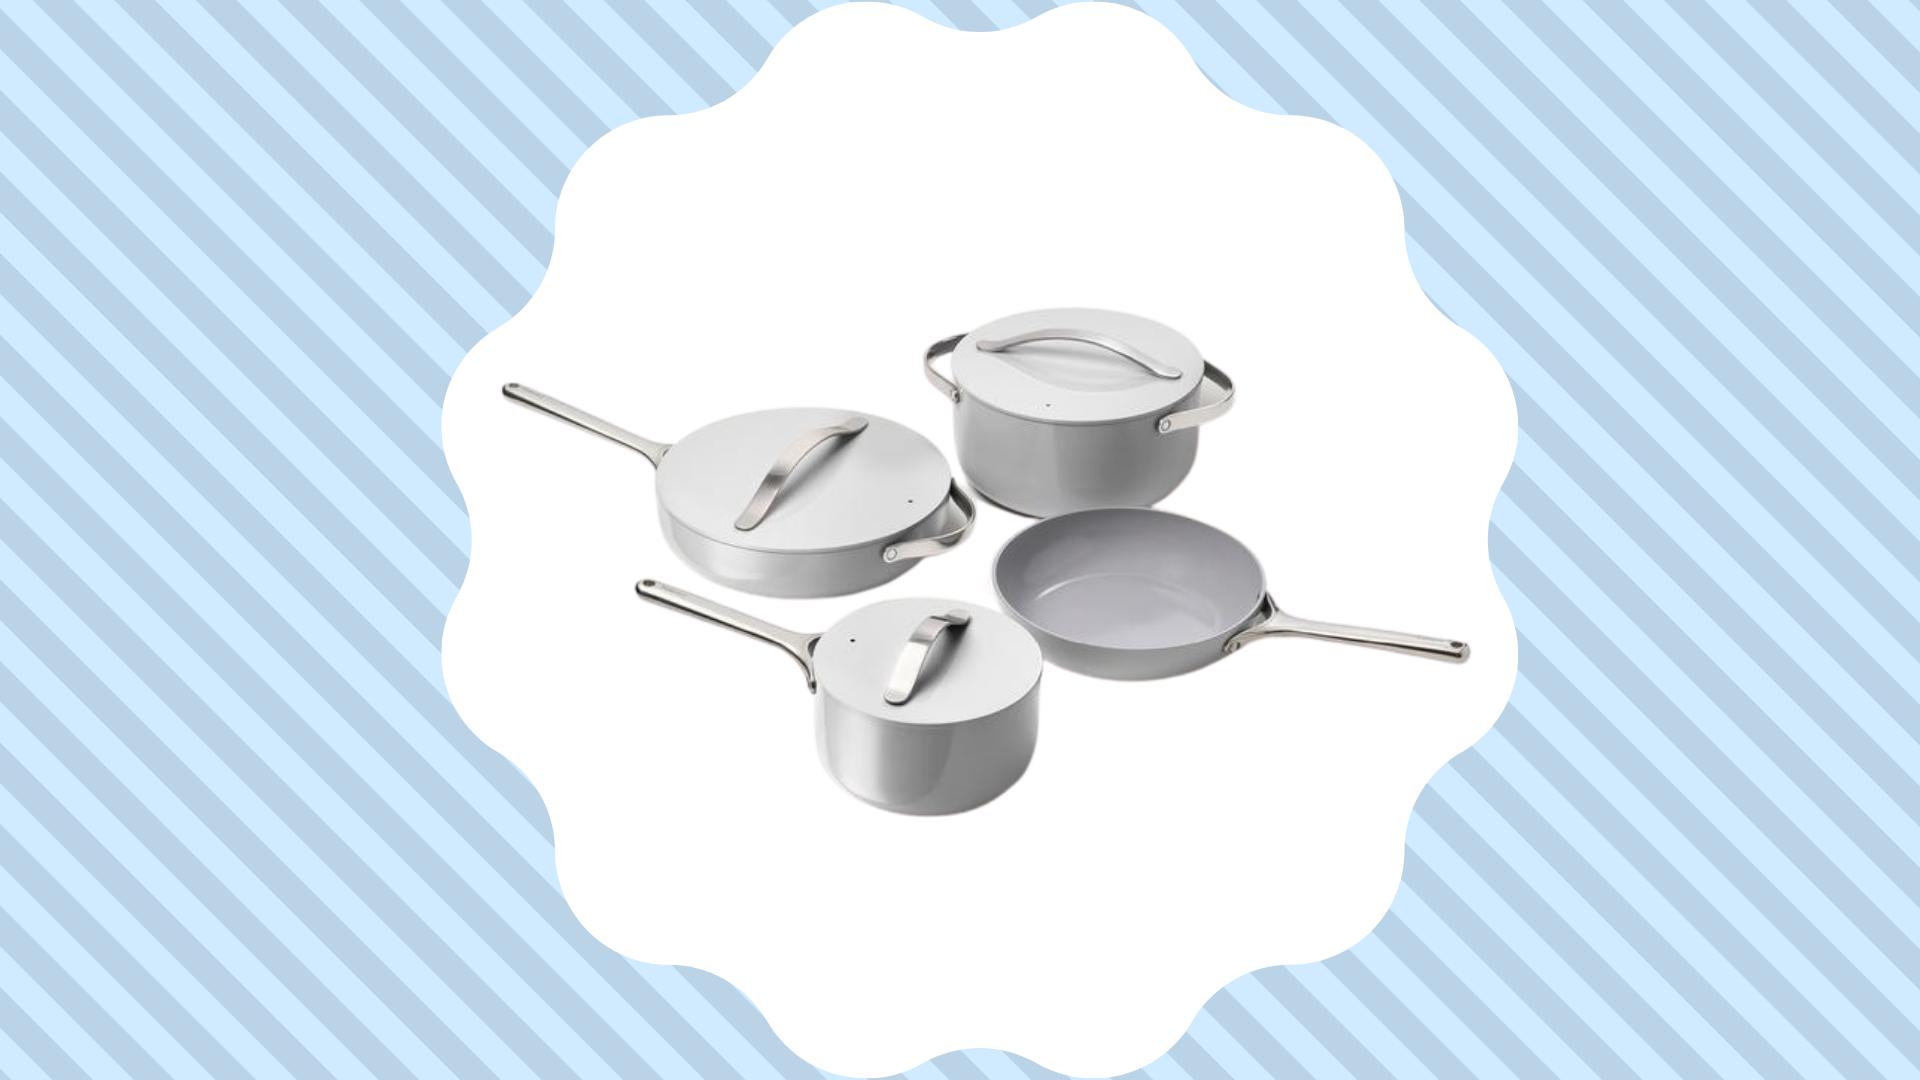 caraway cookware set in gray